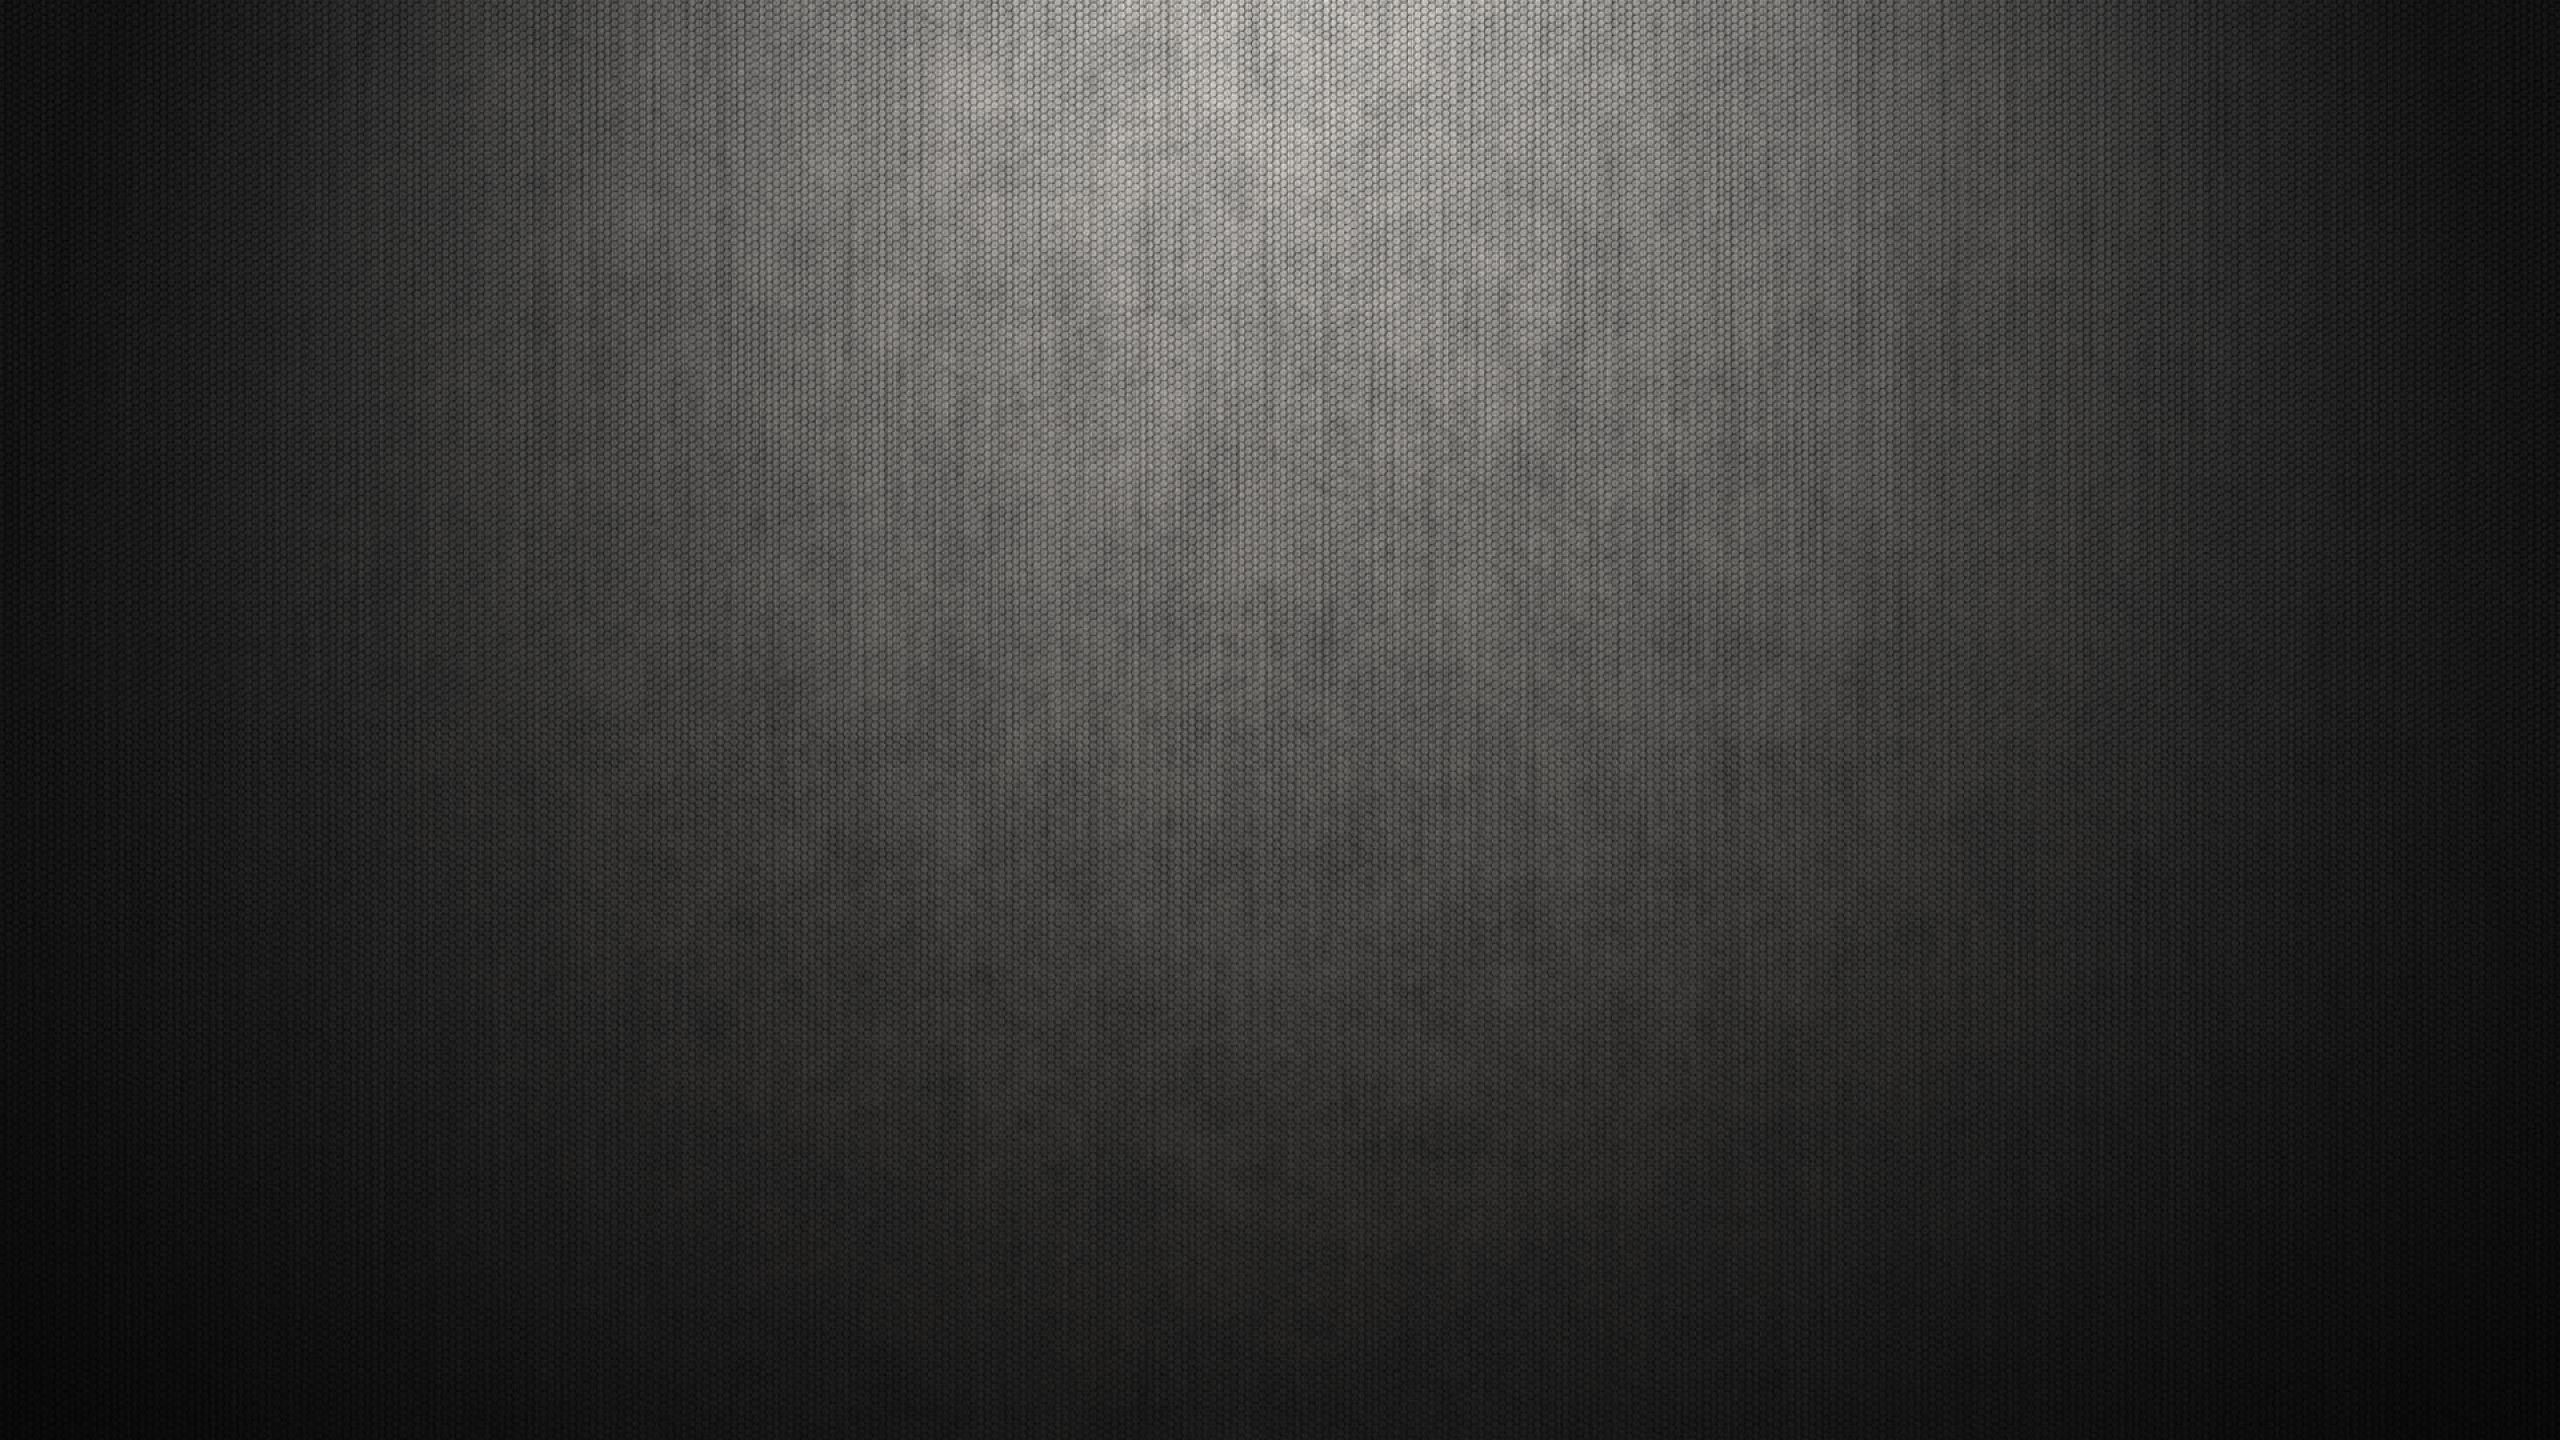 2560x1440 Wallpaper Gray Black Shadow Surface Line Grey Wallpaper Background Grey Pattern Wallpaper Dark Grey Wallpaper